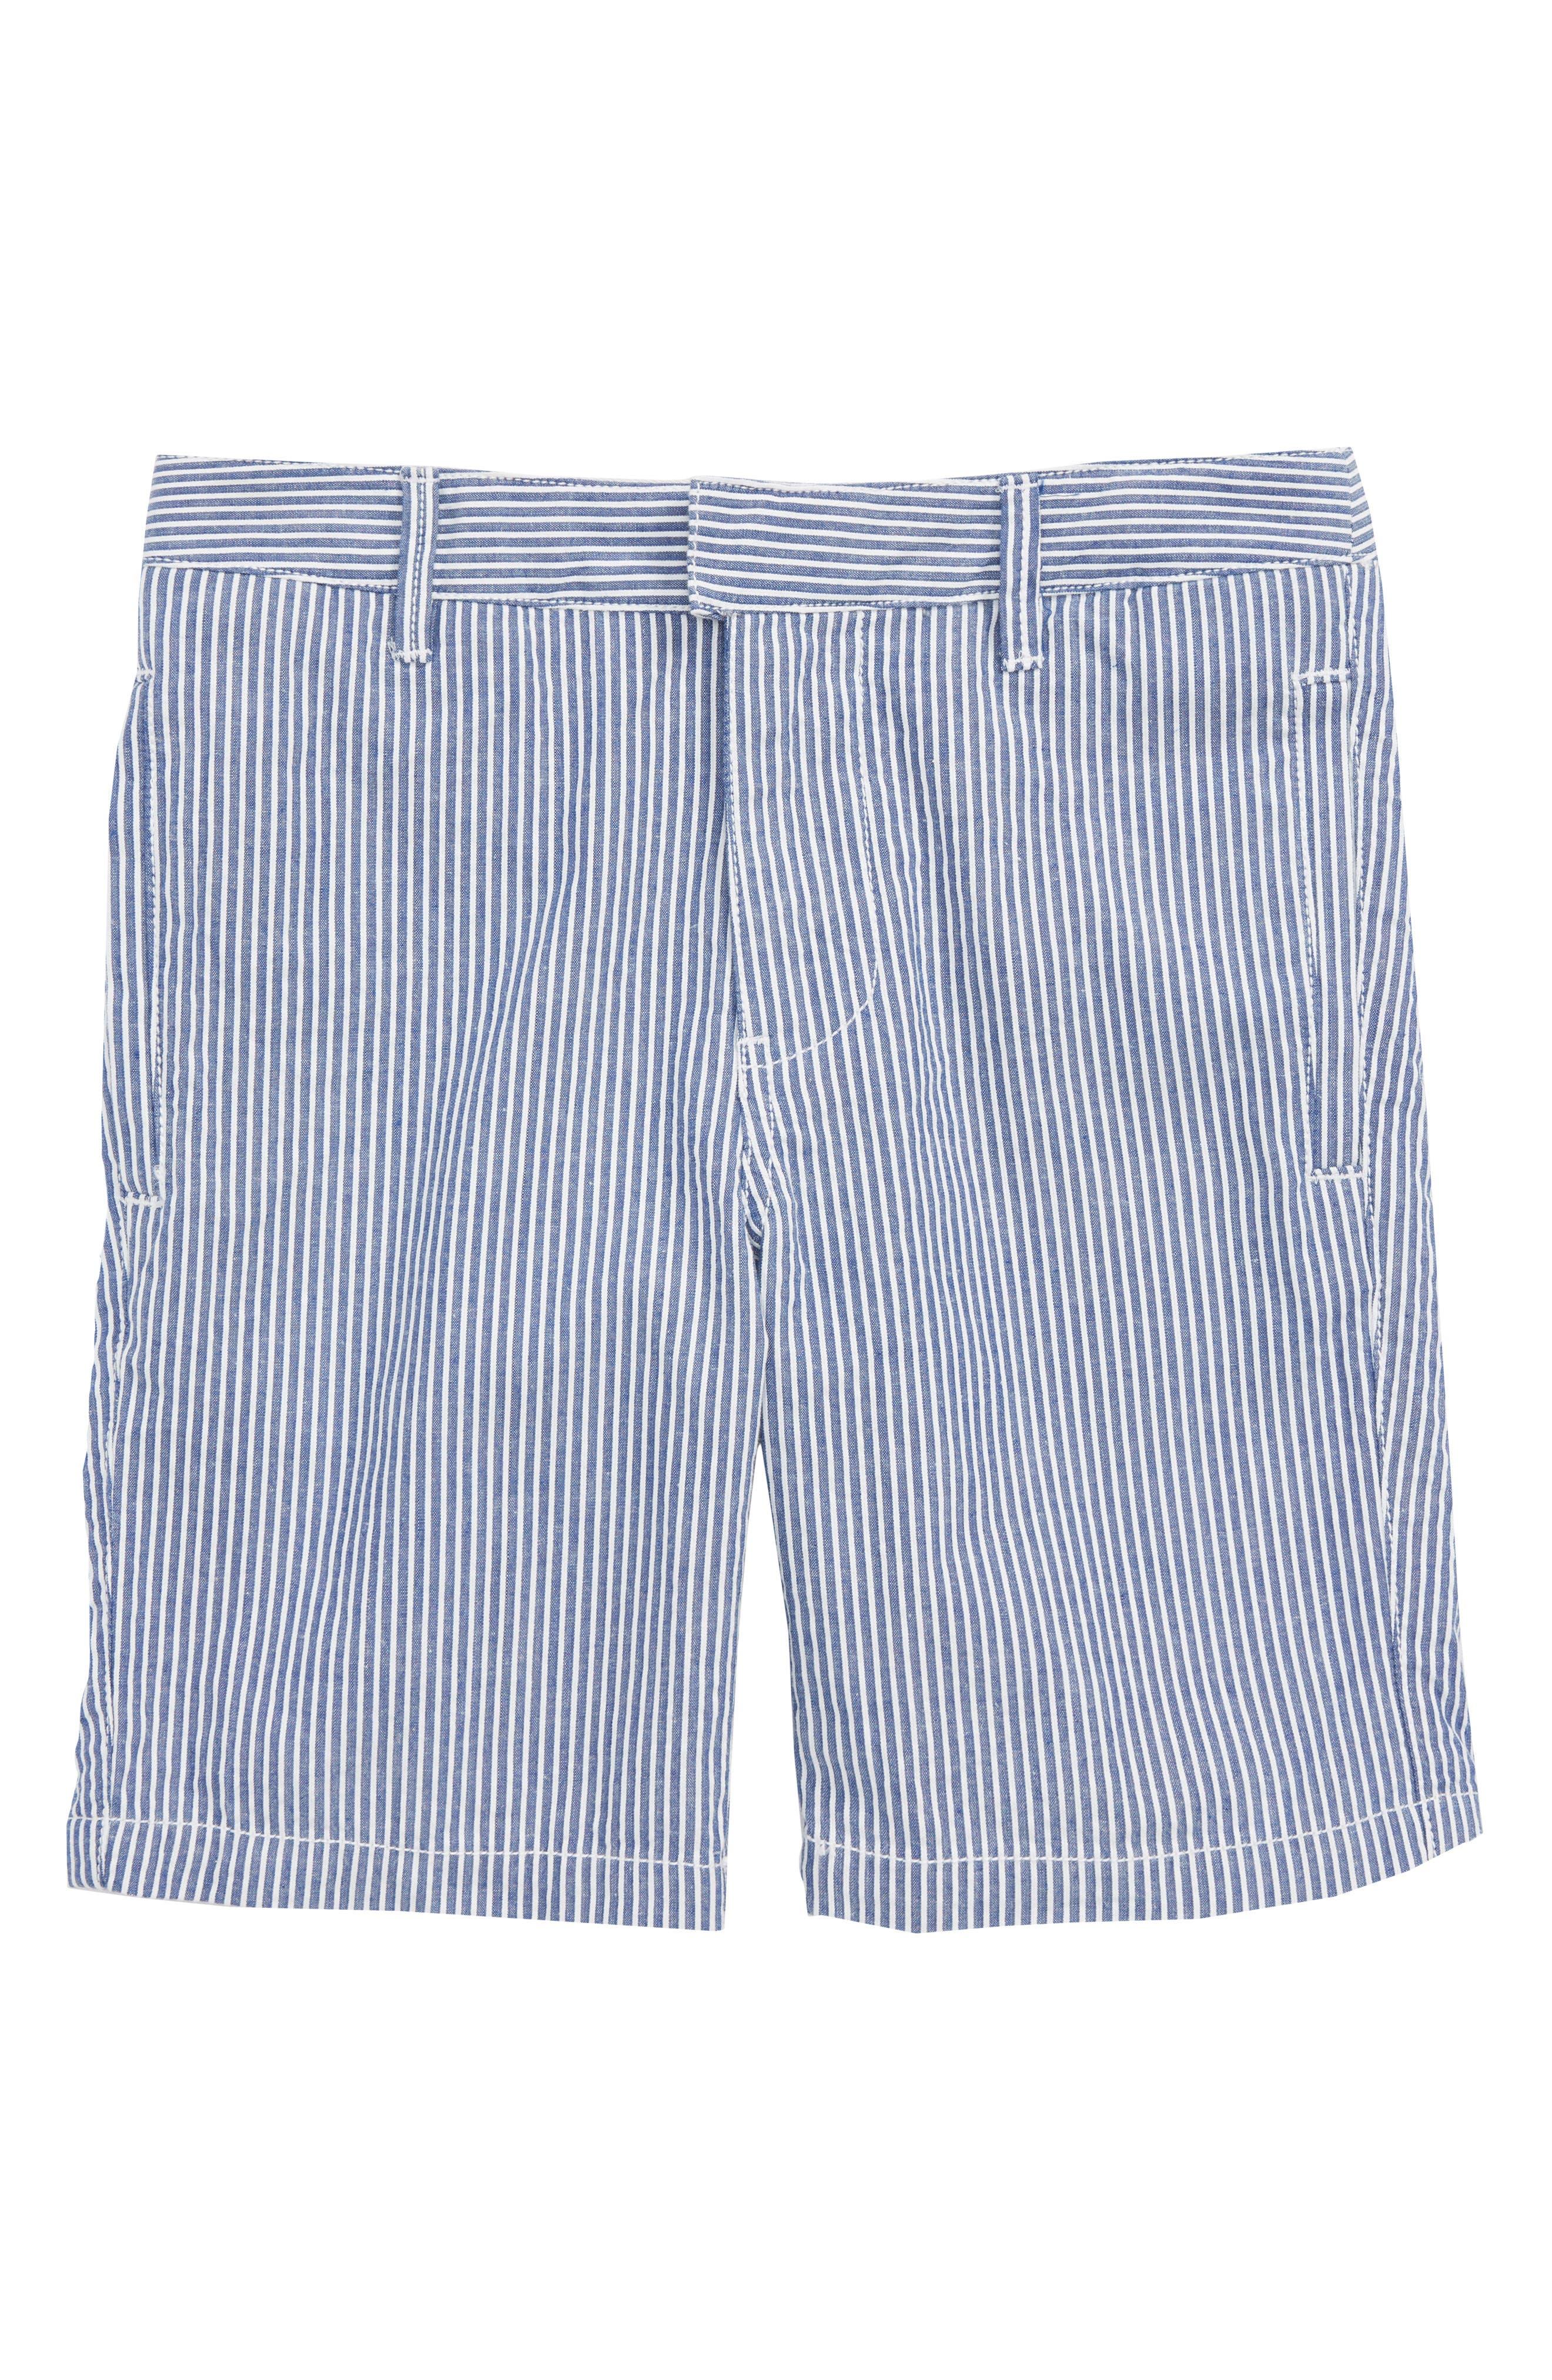 Smart Stripe Shorts,                             Main thumbnail 1, color,                             Duke Blue/ Ecru Seersucker